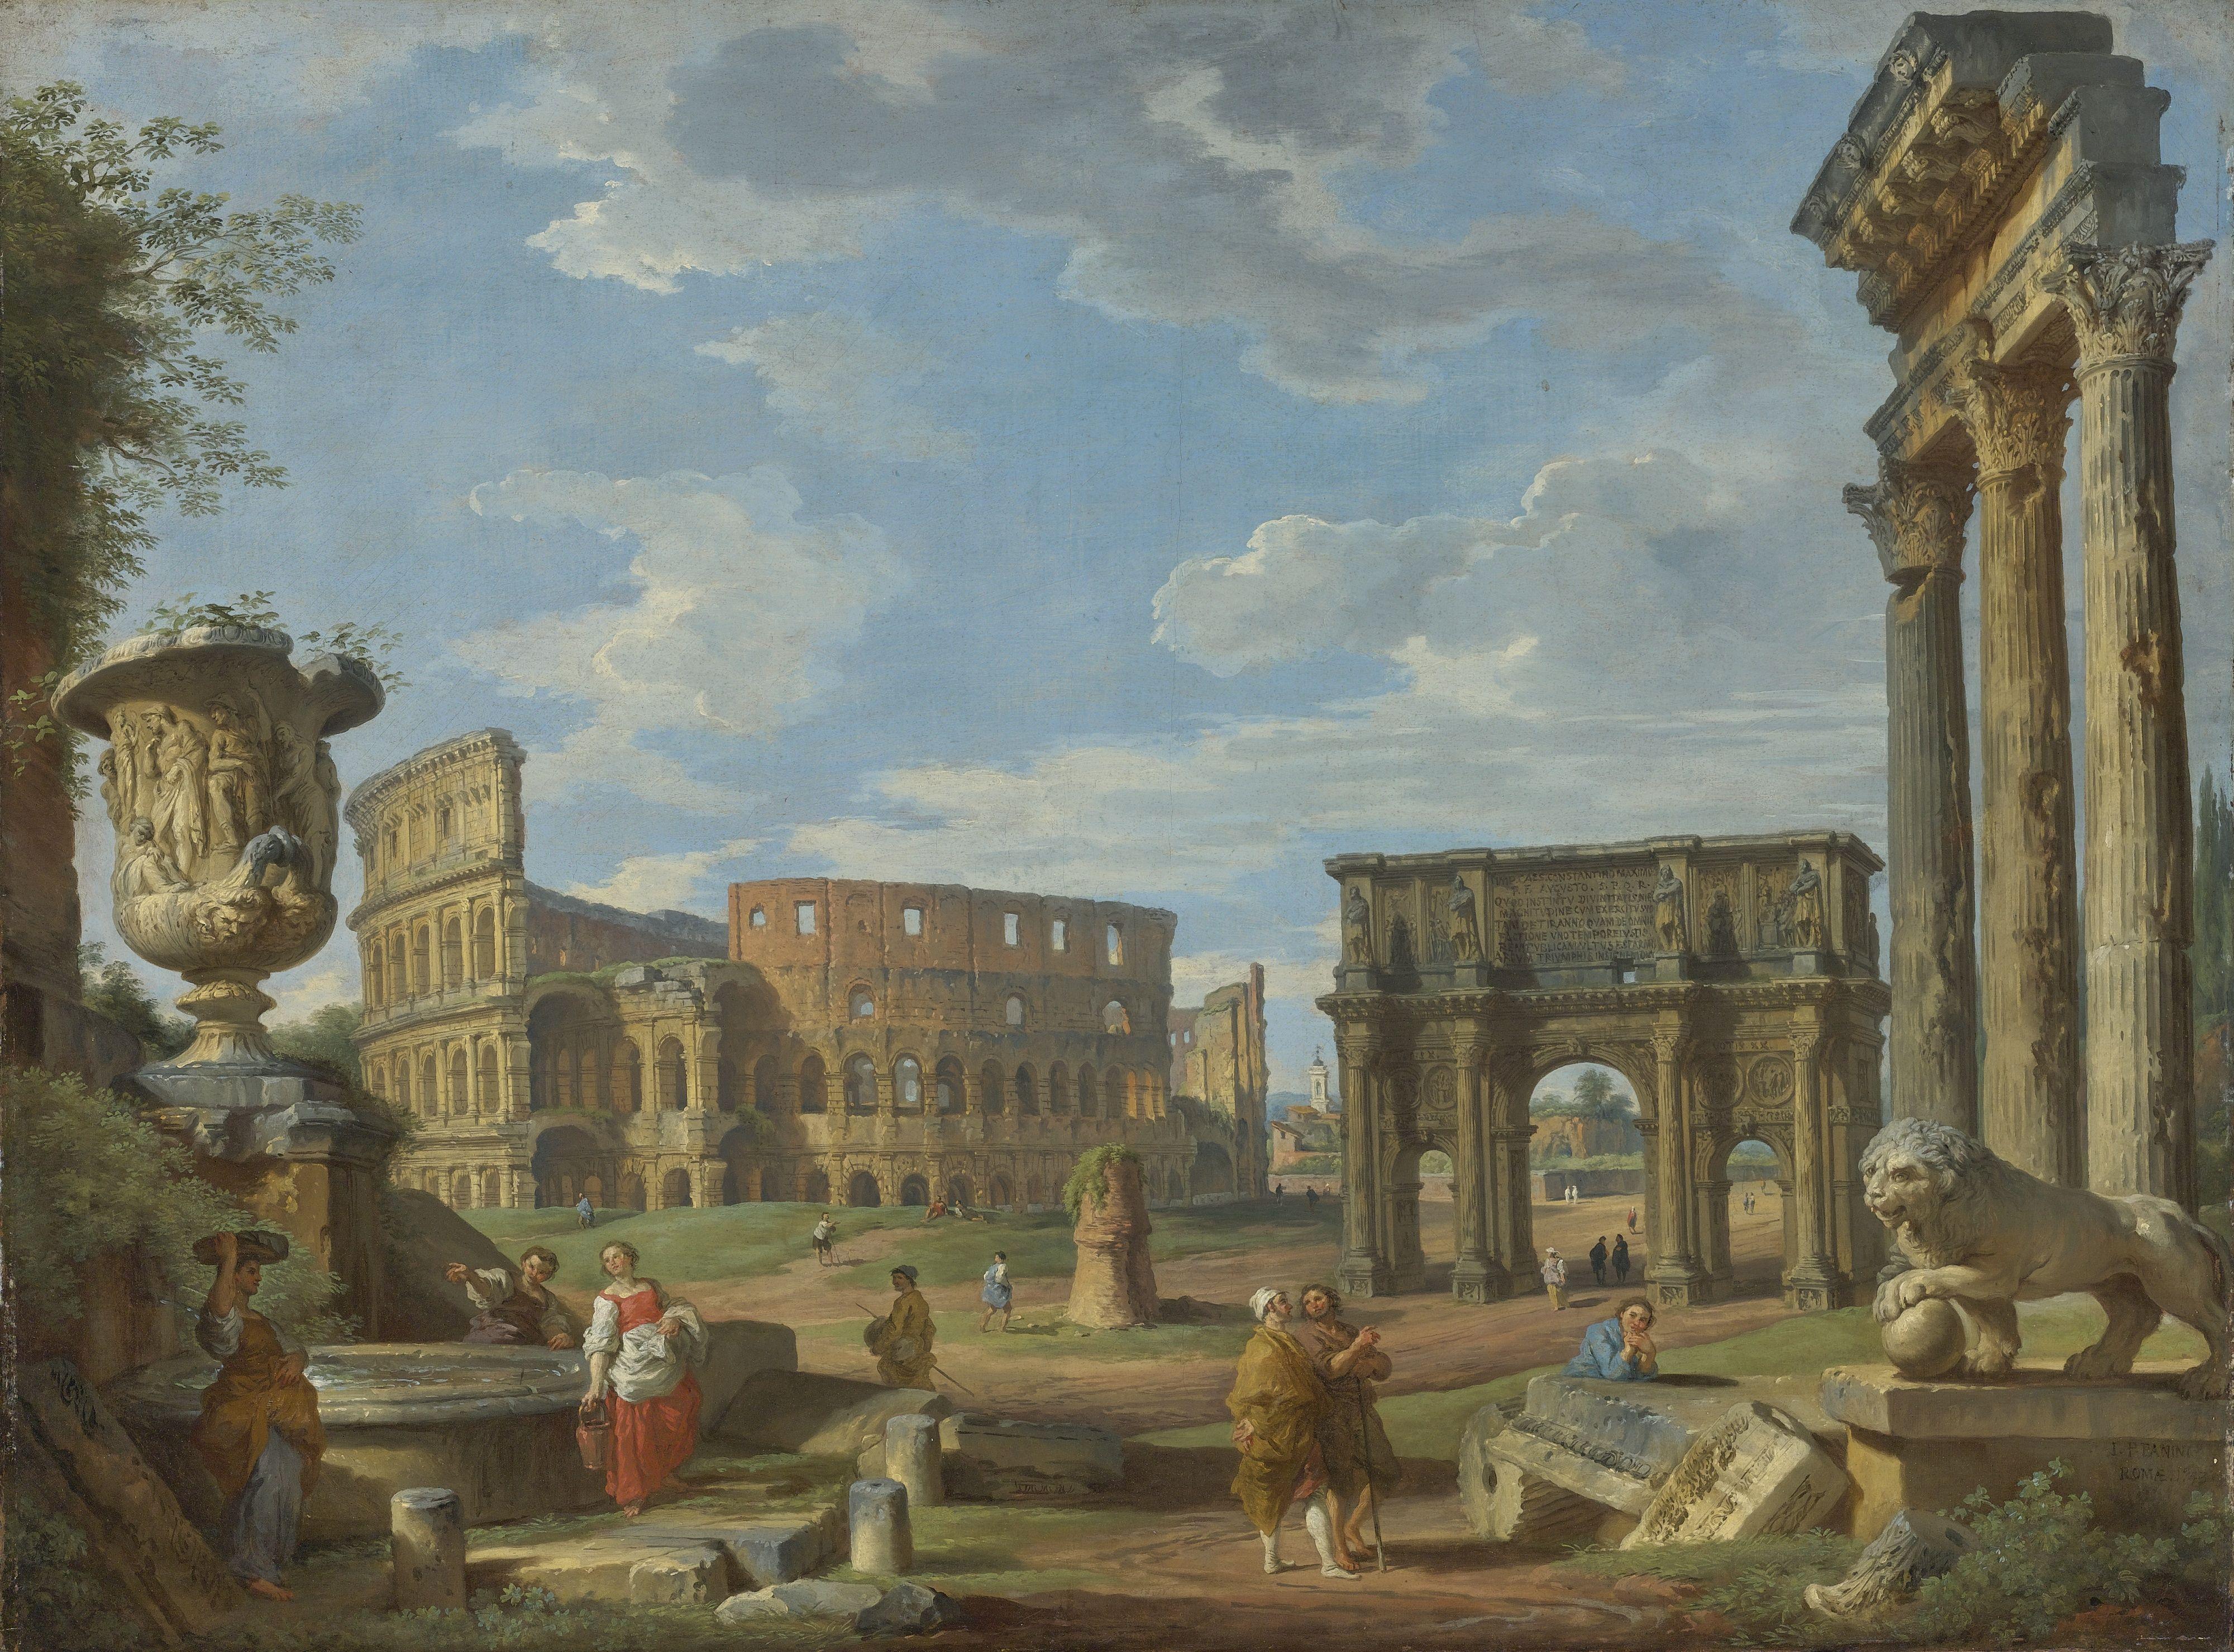 картинки римской эпохи узкий